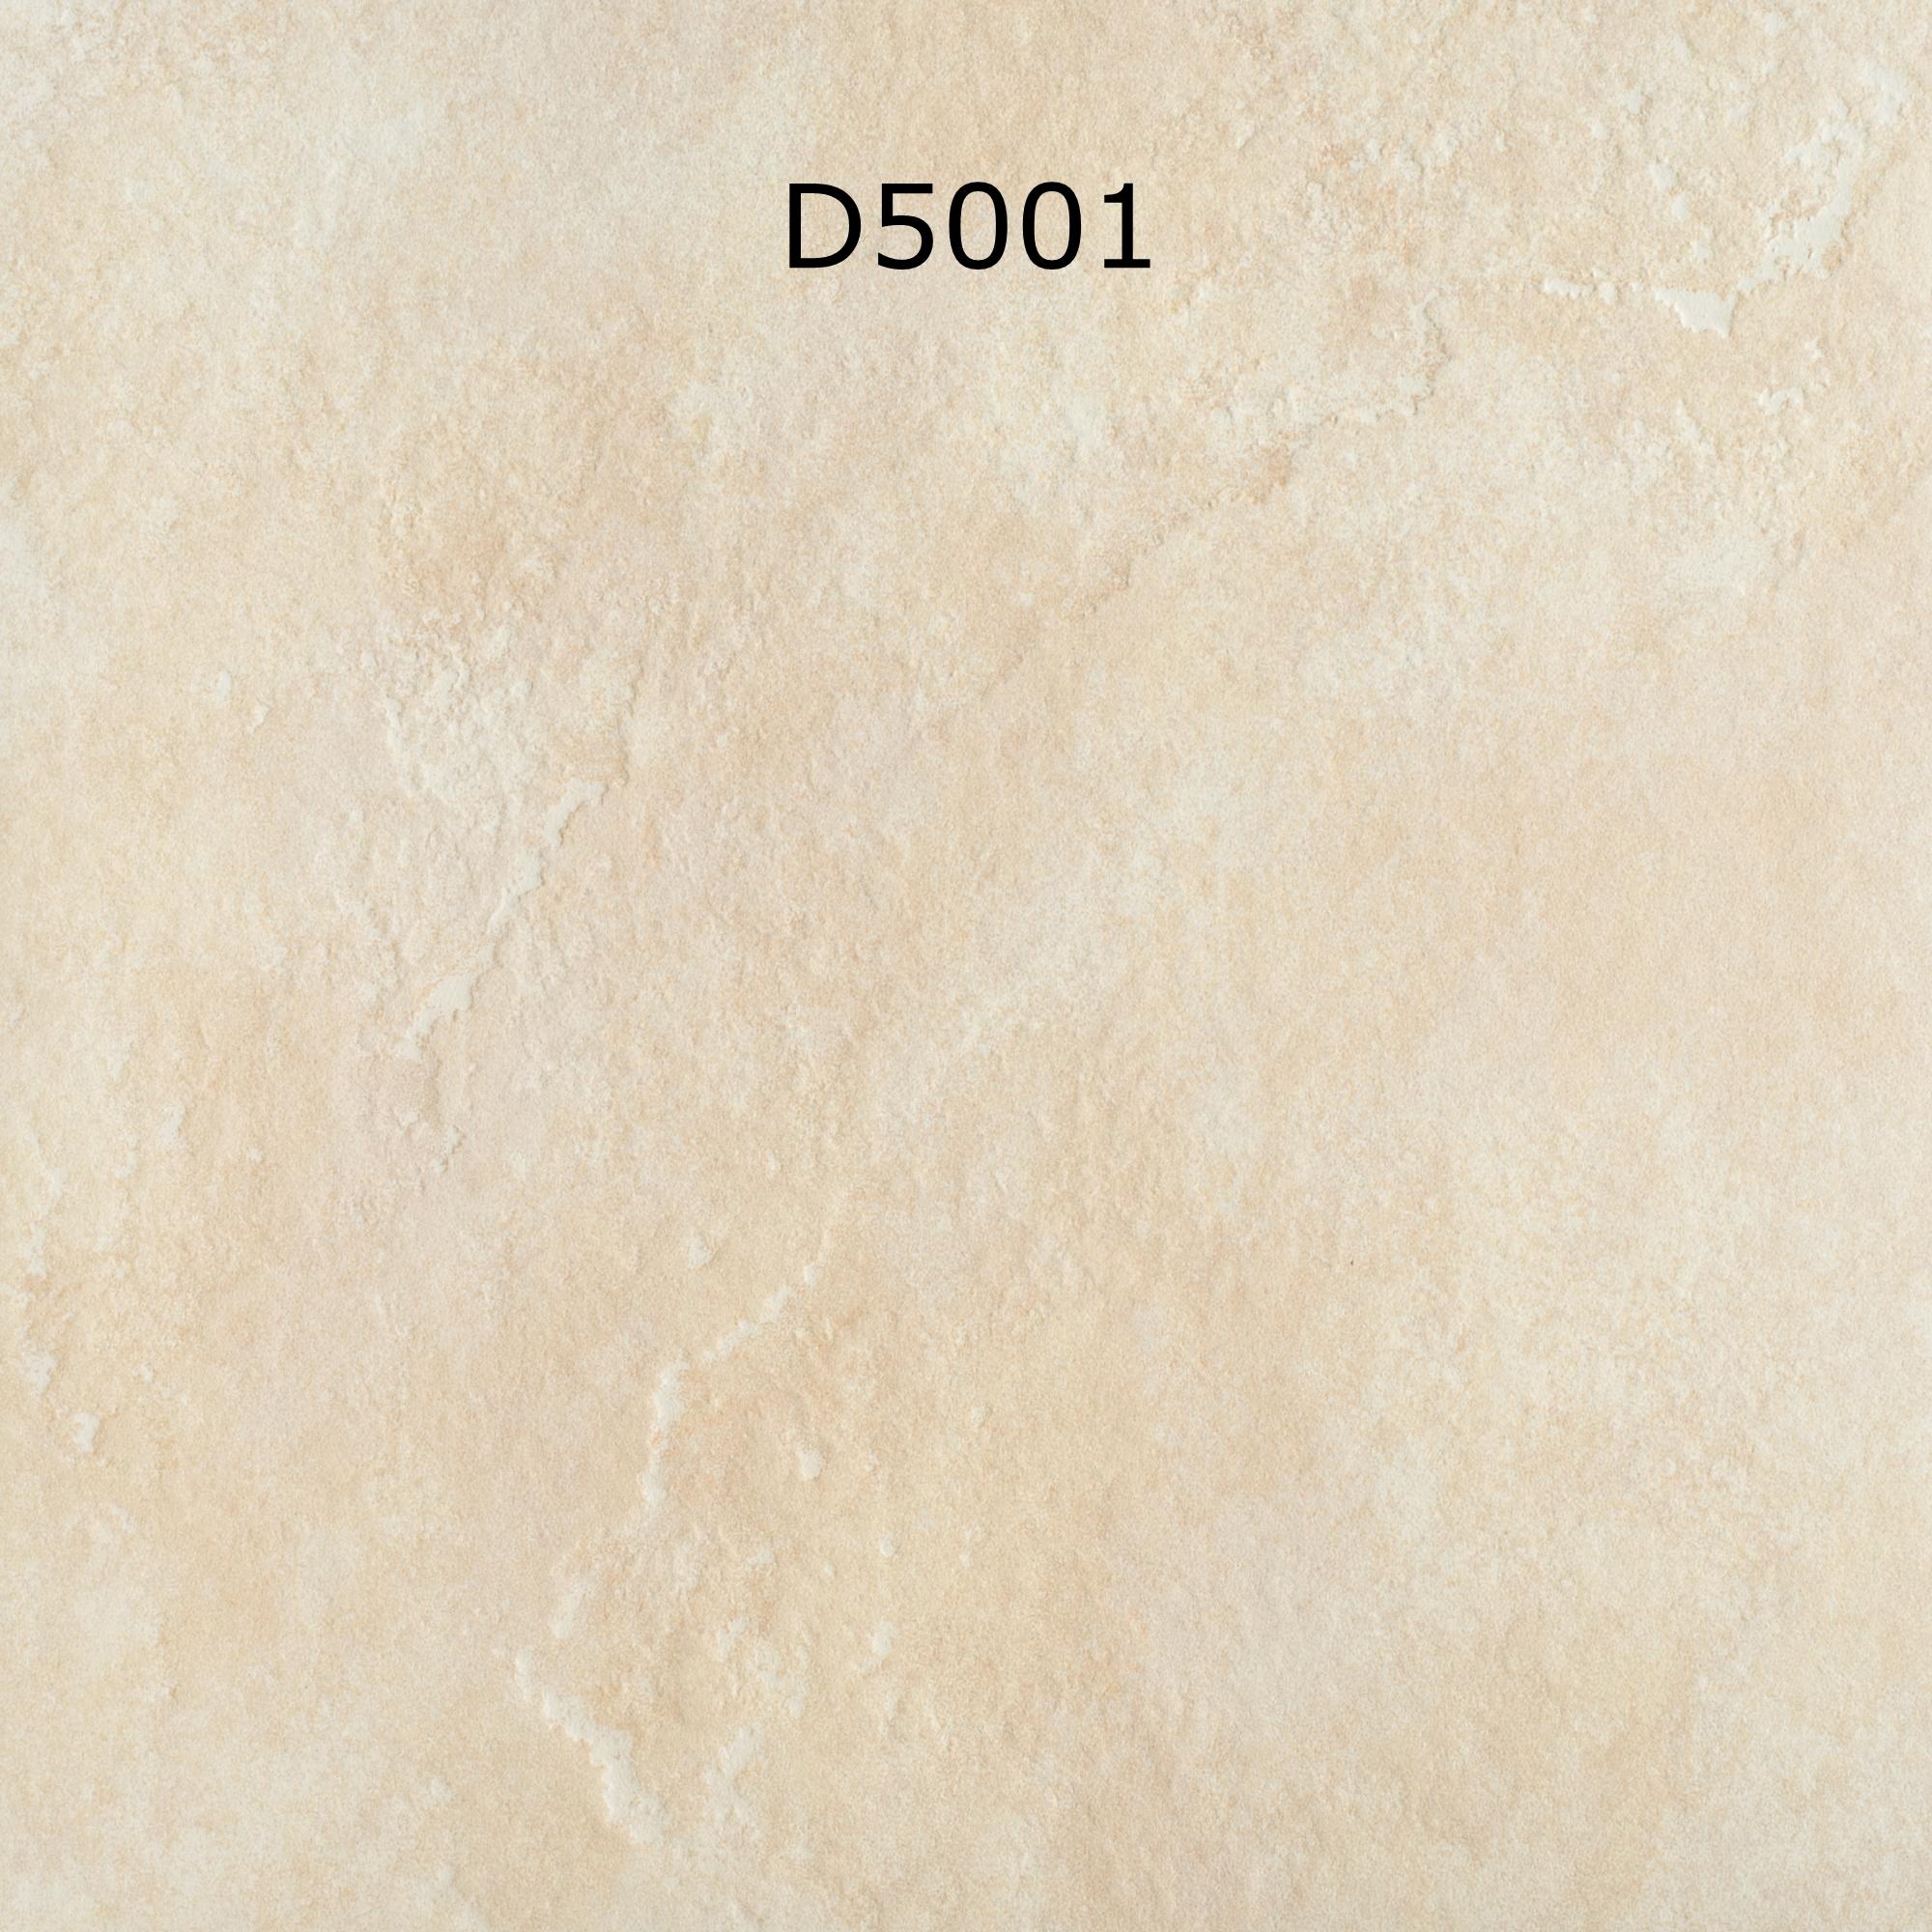 D5001